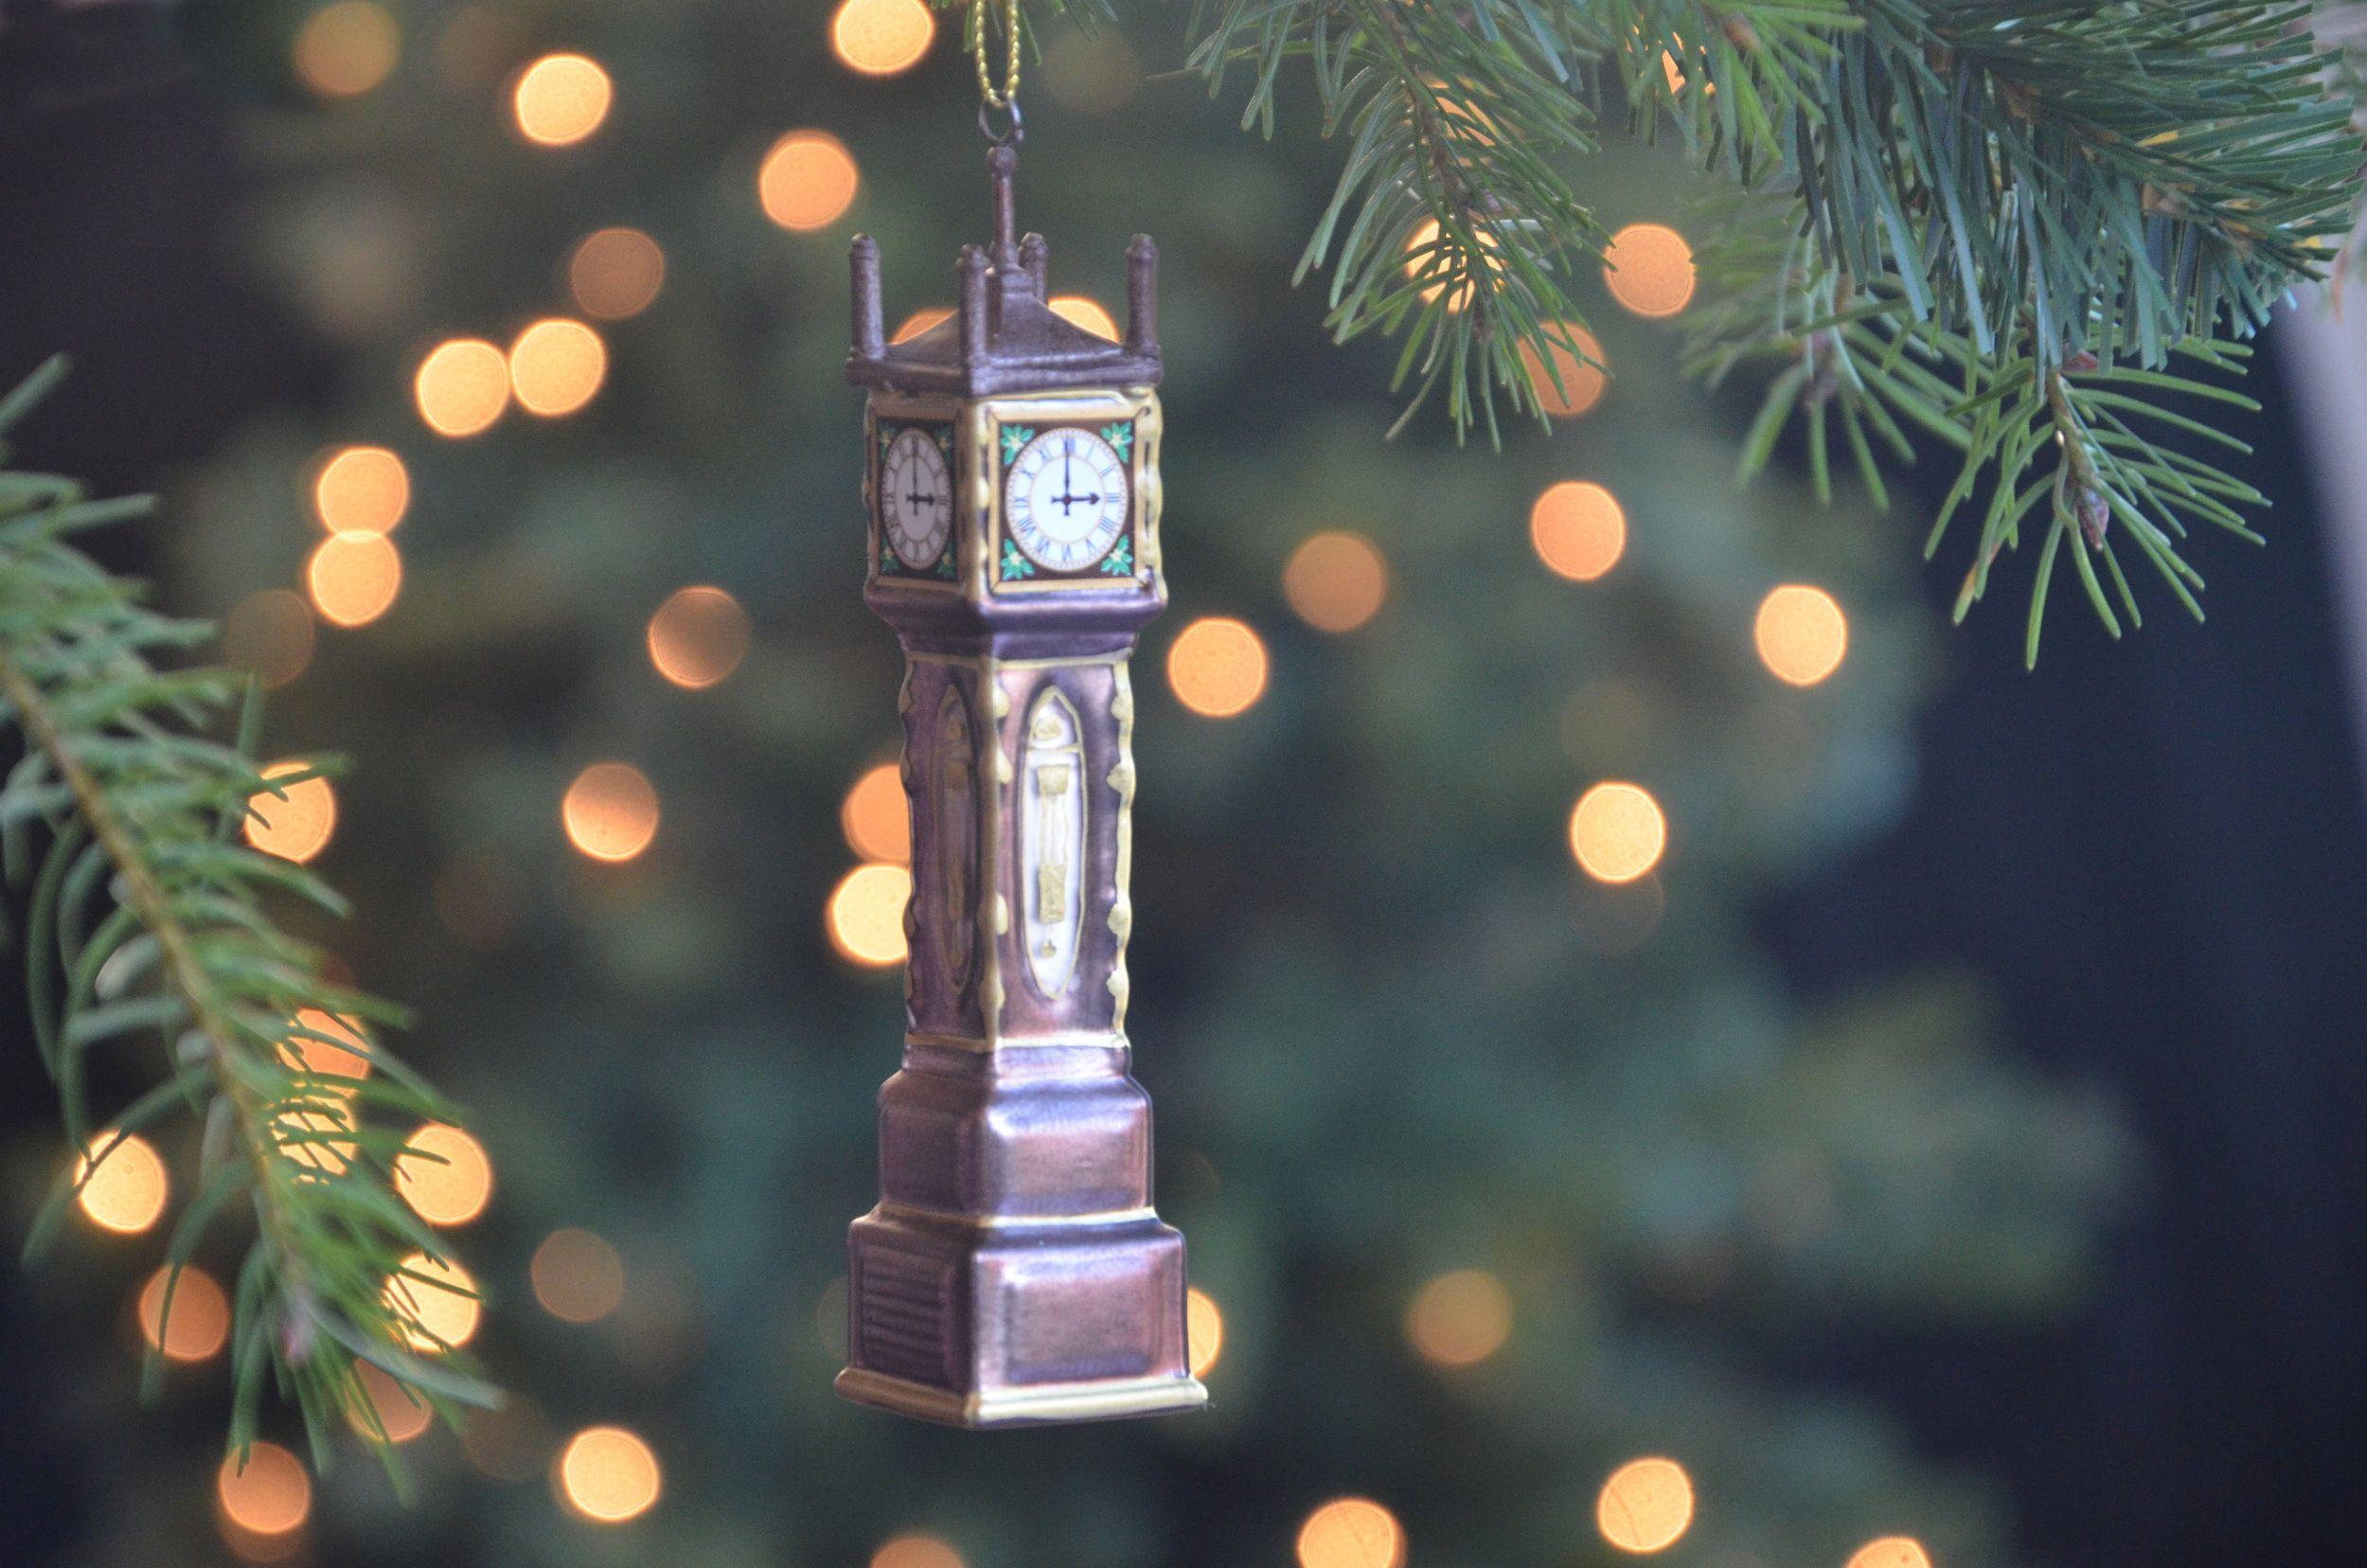 Gastown Steam Clock Blown Glass Ornament Christmas Ornaments Christmas Decorations Christmas